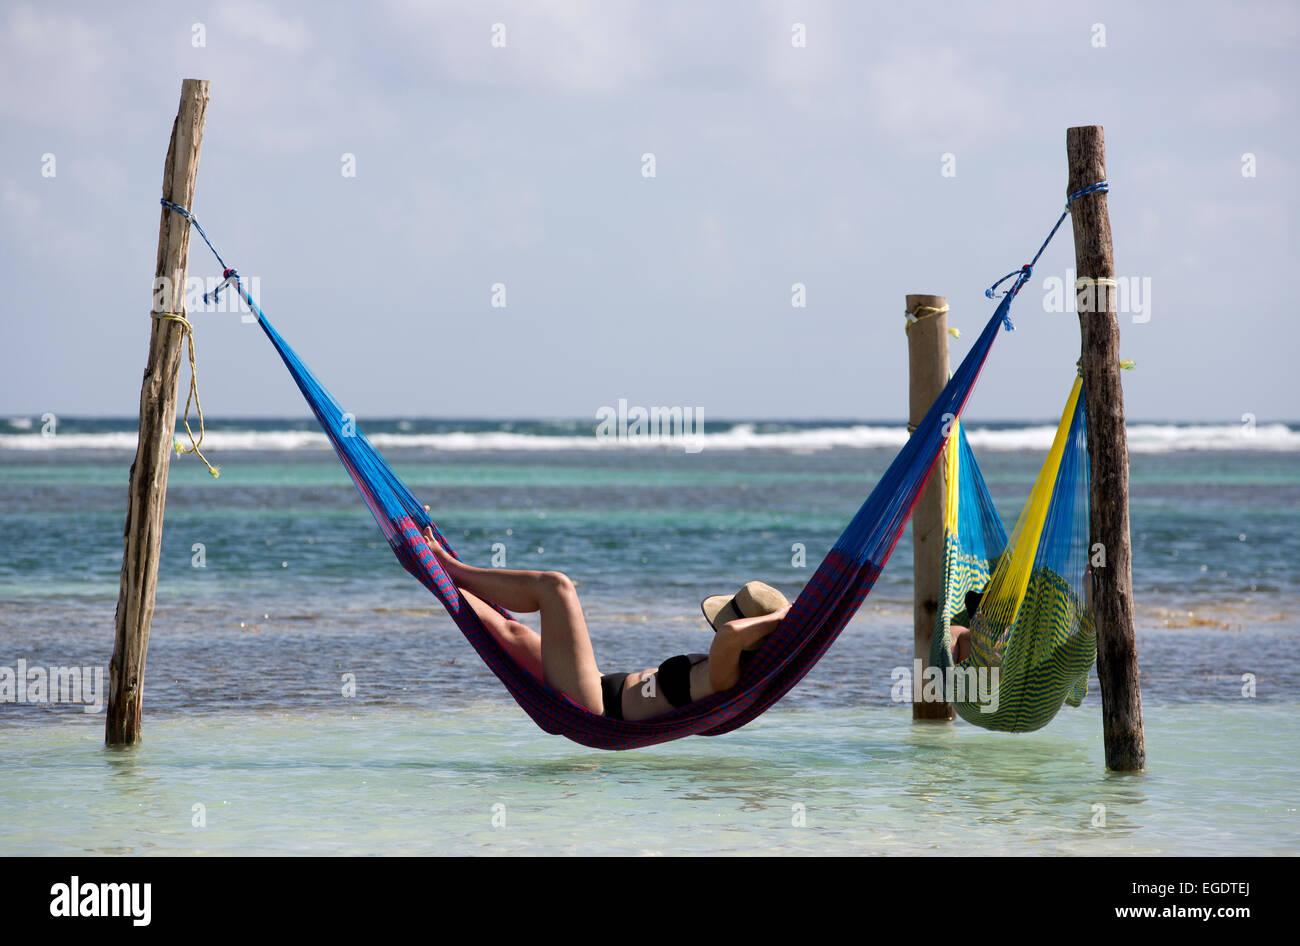 People in hammocks on the beach at Mahahual Quintana Roo Mexico - Stock Image